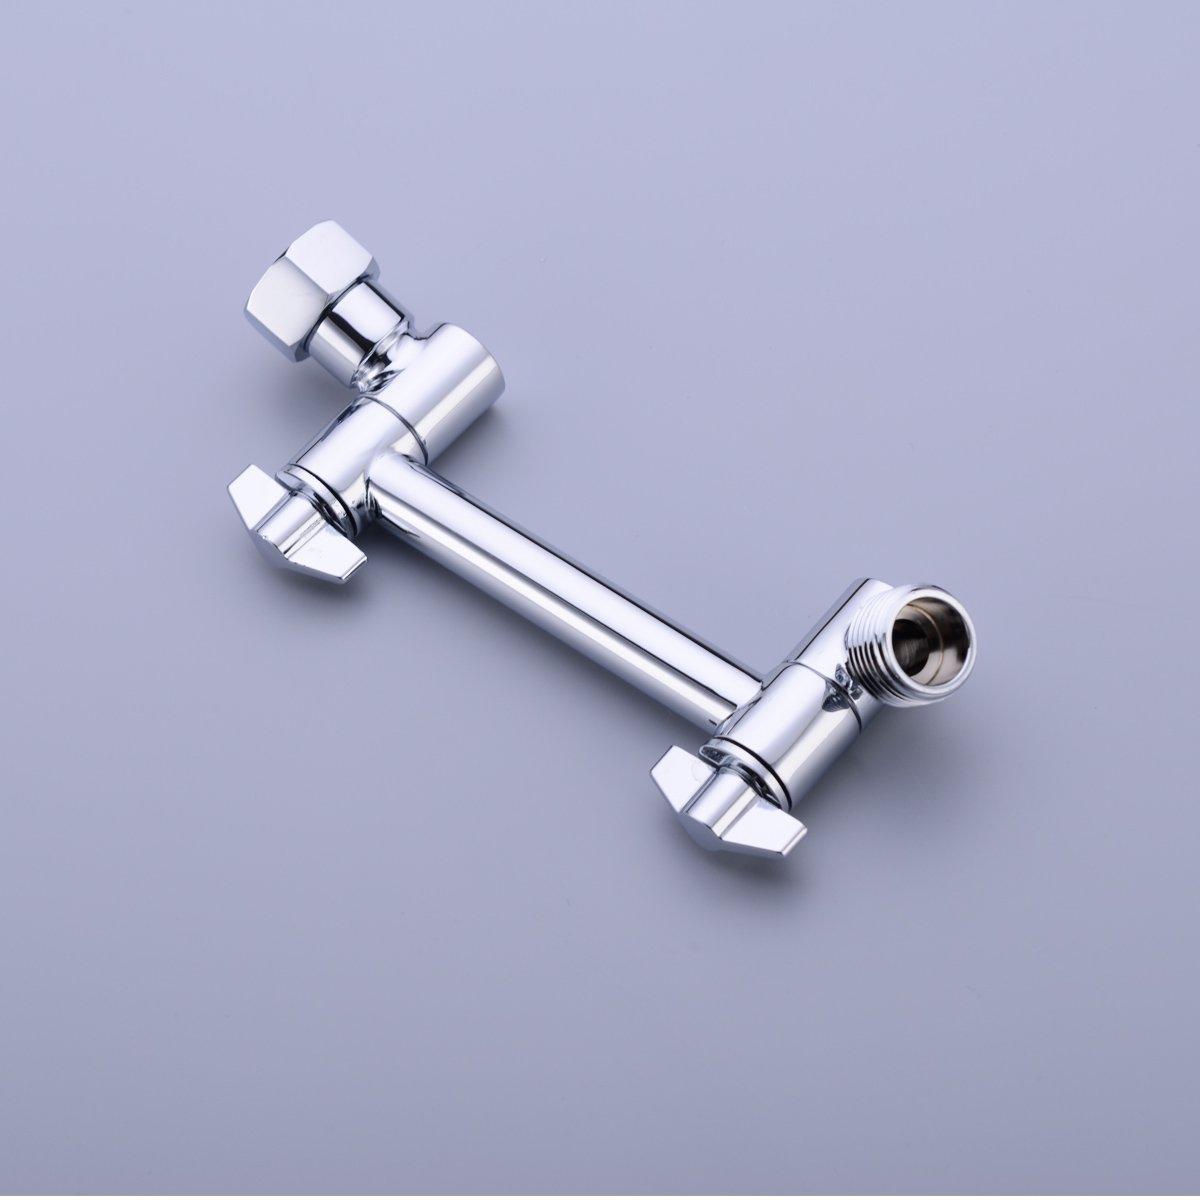 HANEBATH 4 Inch Brass Shower Arm Shower Head Combo Adjustable Height Arm Mount,Chrome by HANEBATH (Image #5)